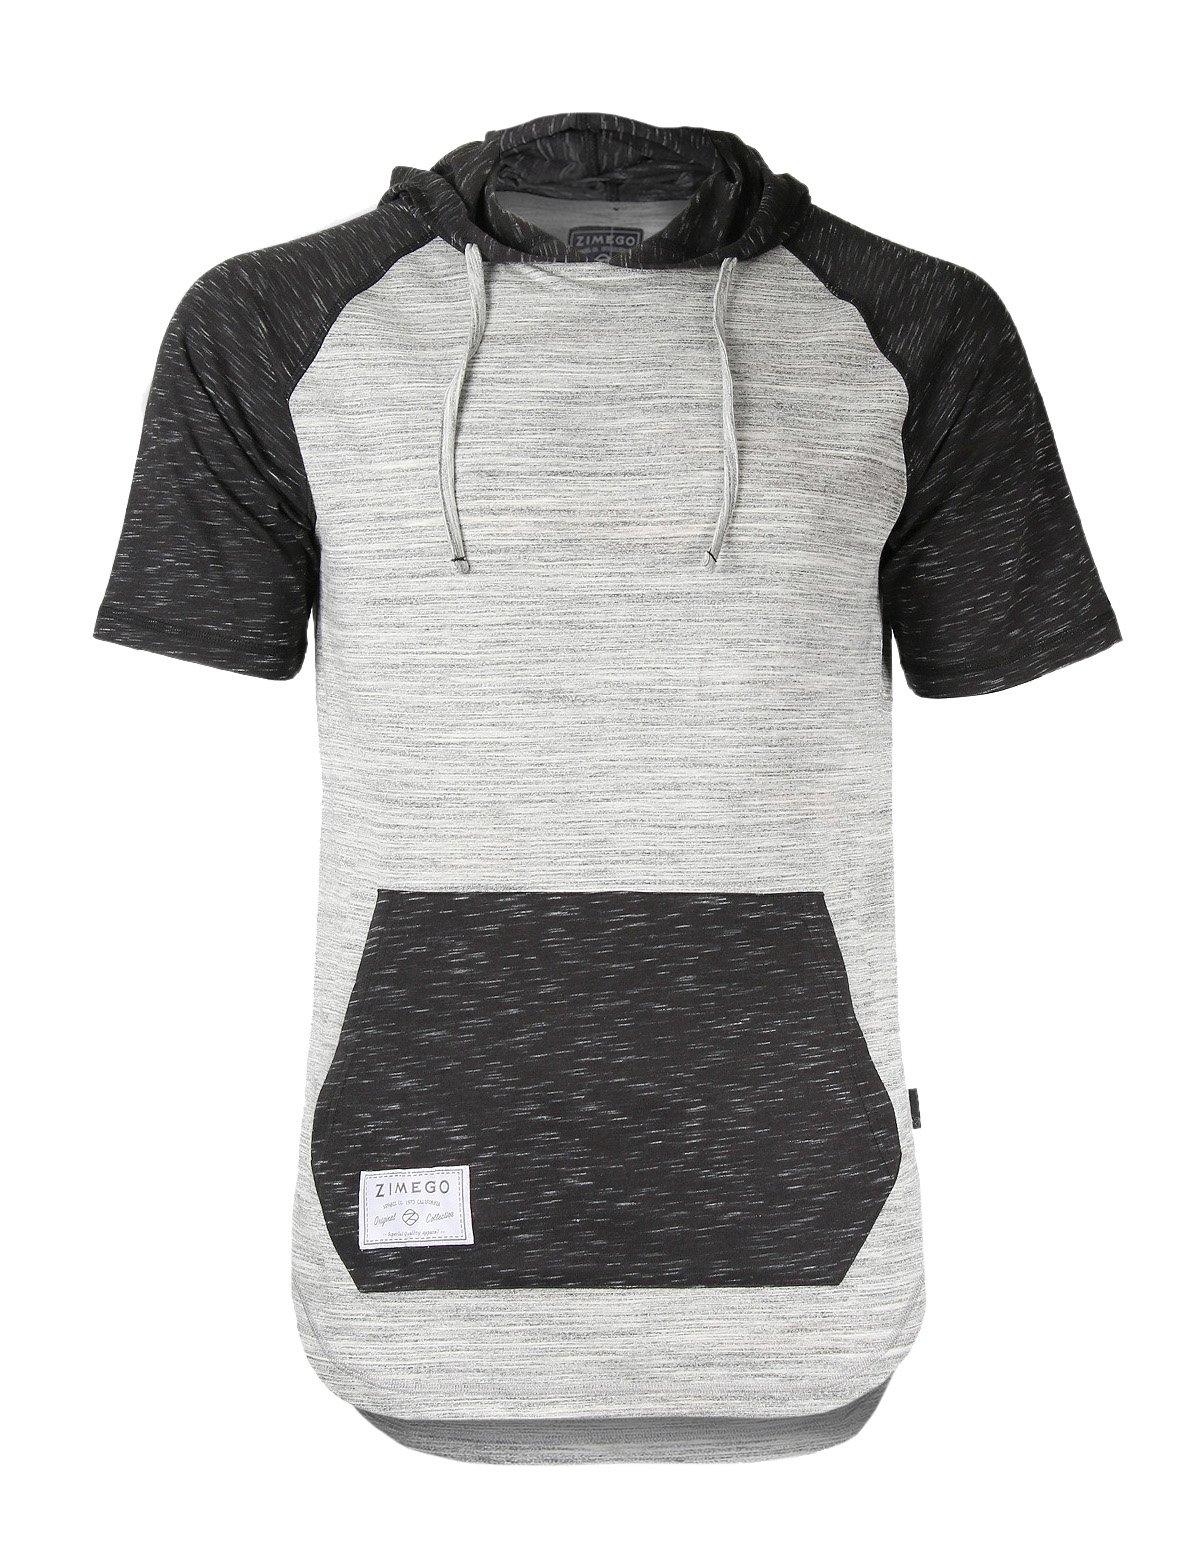 ZIMEGO Men's Short Sleeve Raglan Hoodie Round Bottom Semi Longline T-Shirt (U.S Large, H Grey Fulfilled by Amazon)